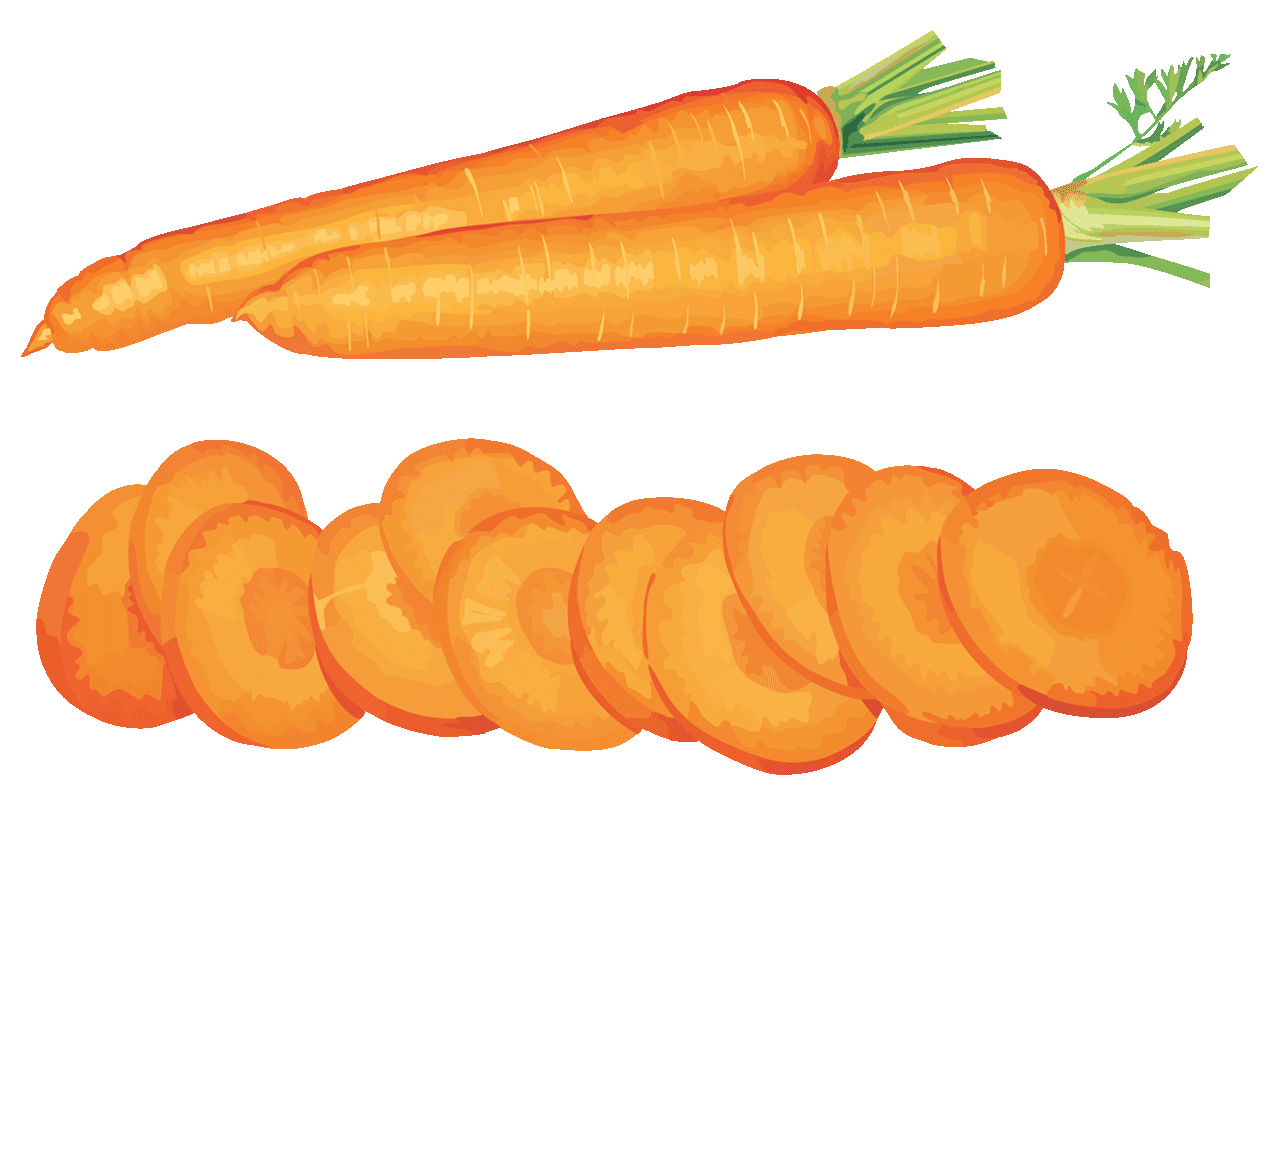 Zucchini clipart vegetable. Carrot fruit clip art